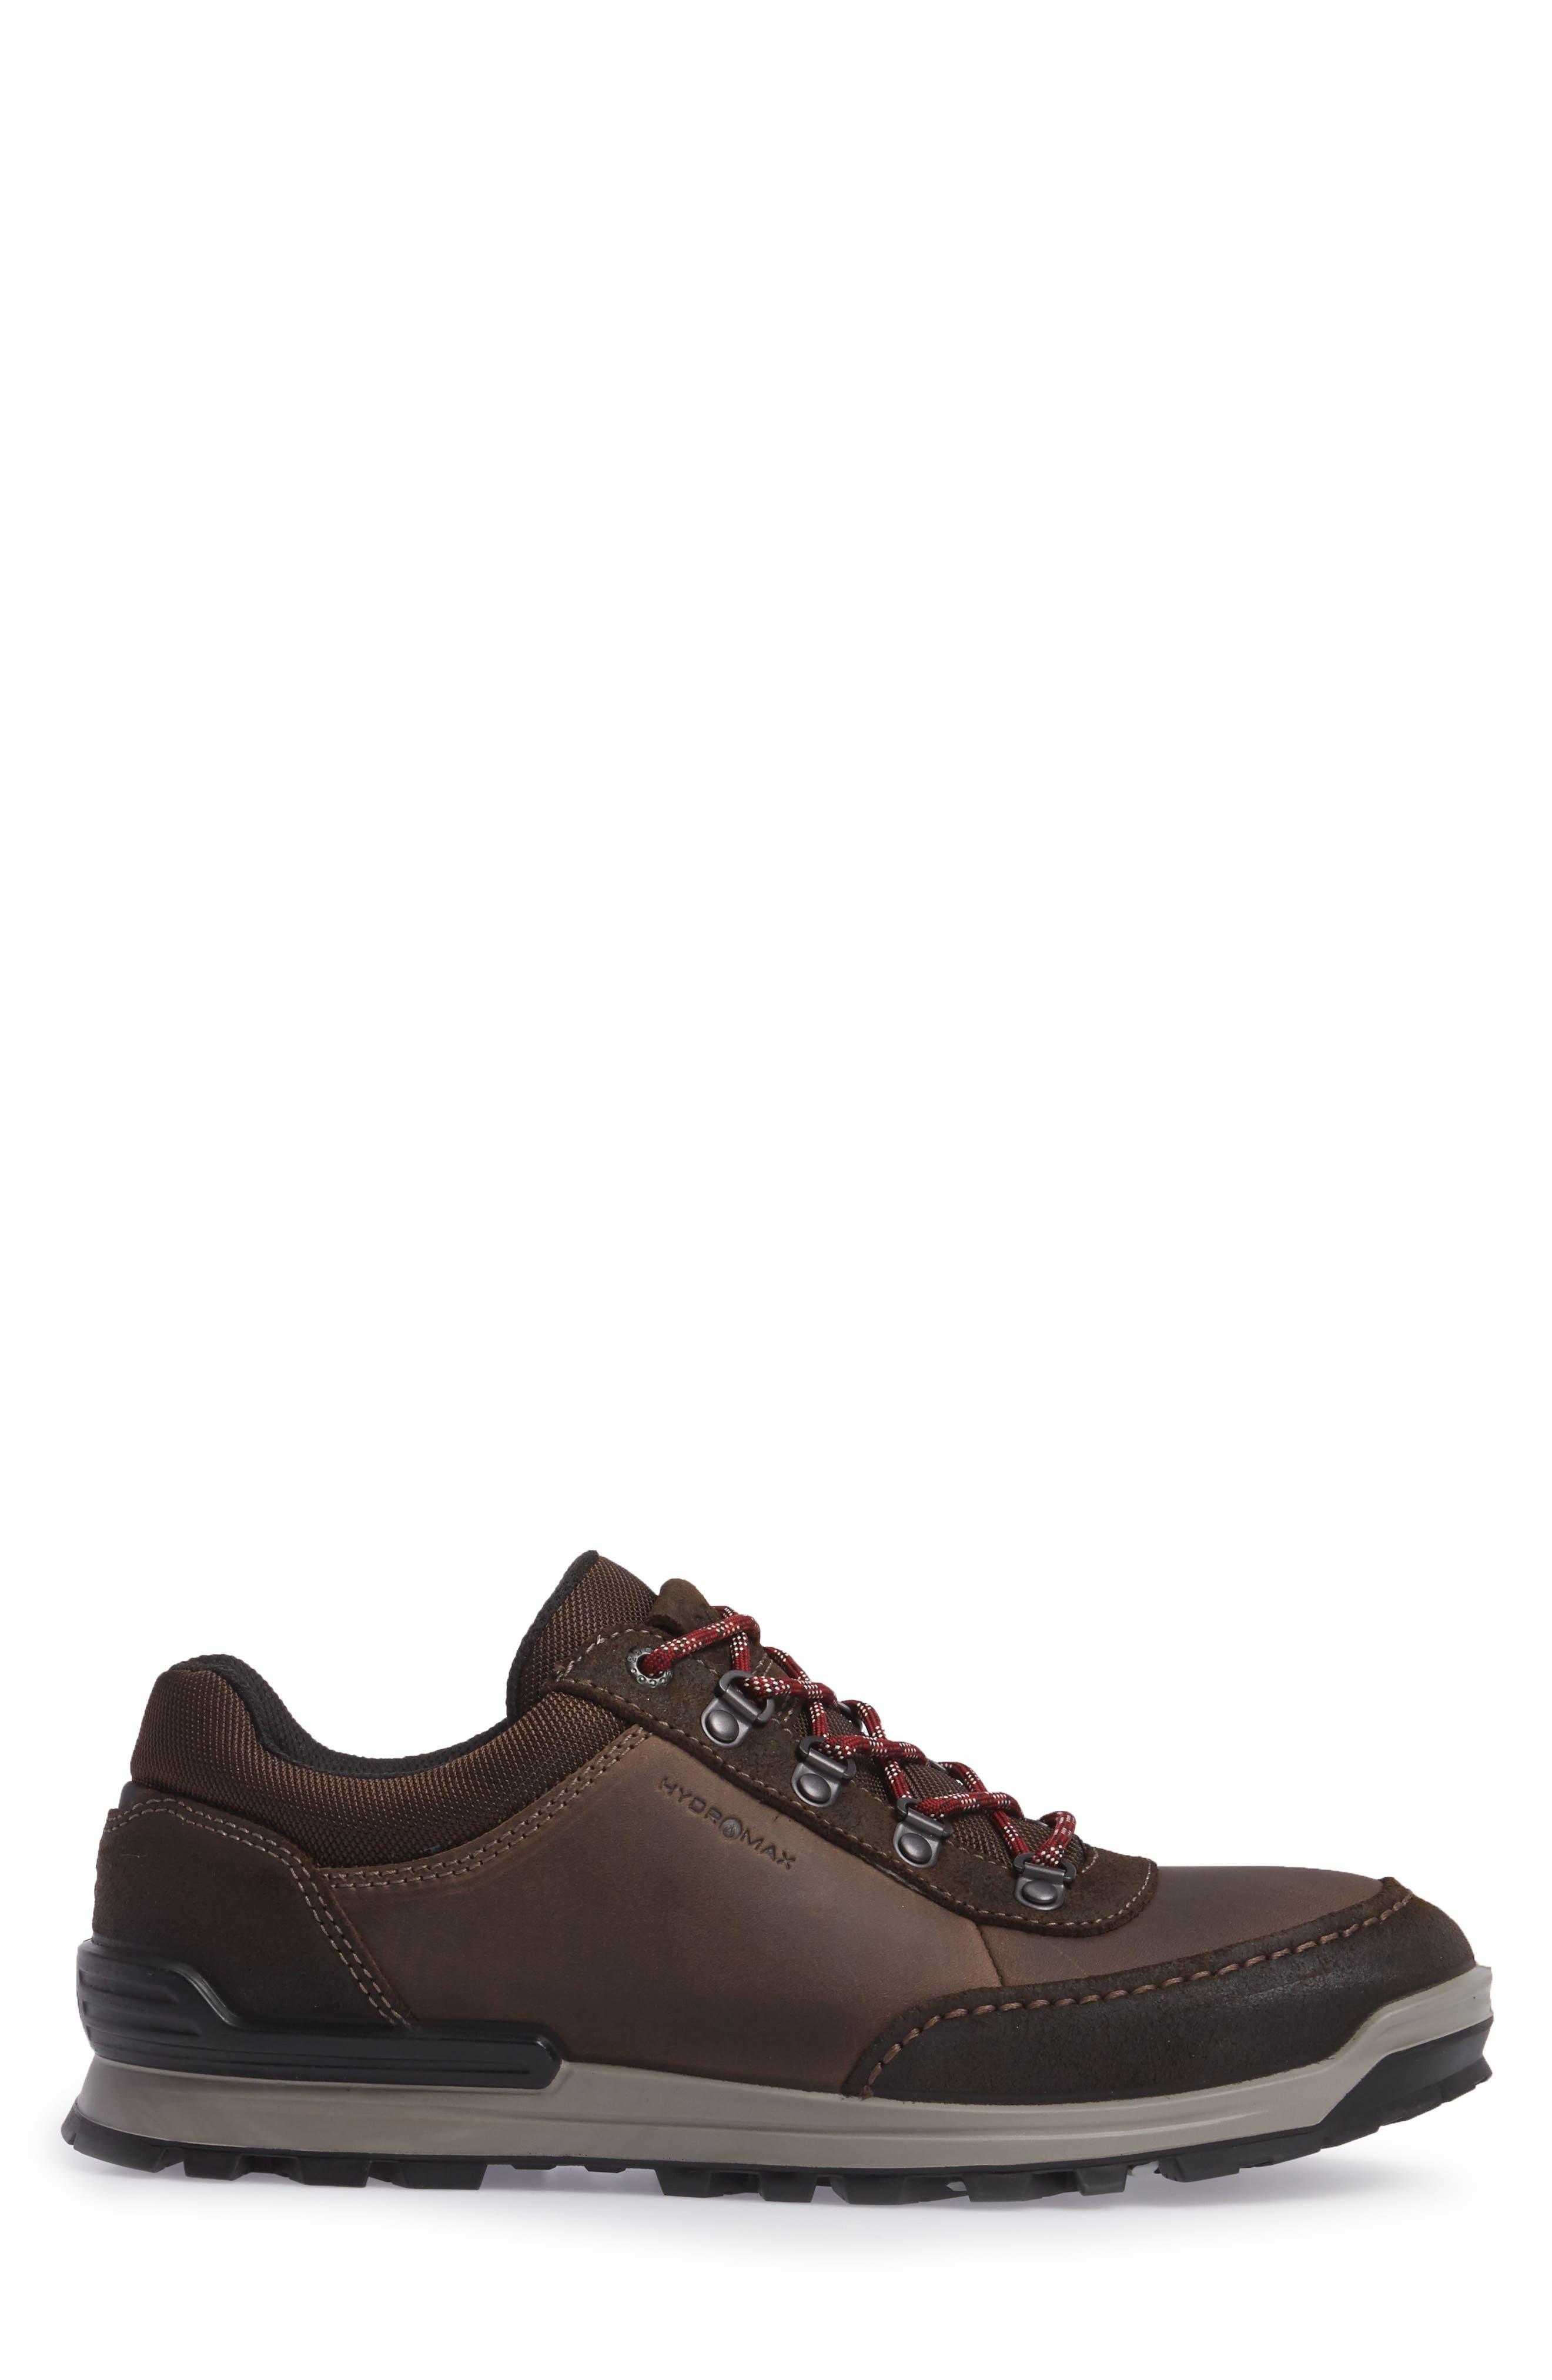 Oregon Sneaker,                             Alternate thumbnail 3, color,                             COFFEE NUBUCK